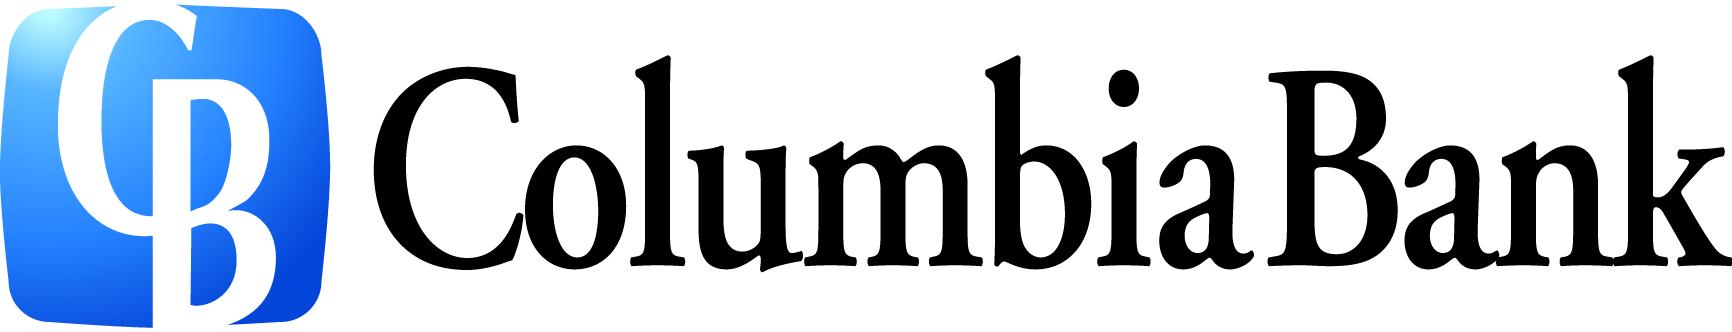 columbia-bank-logo-1460493834.jpg